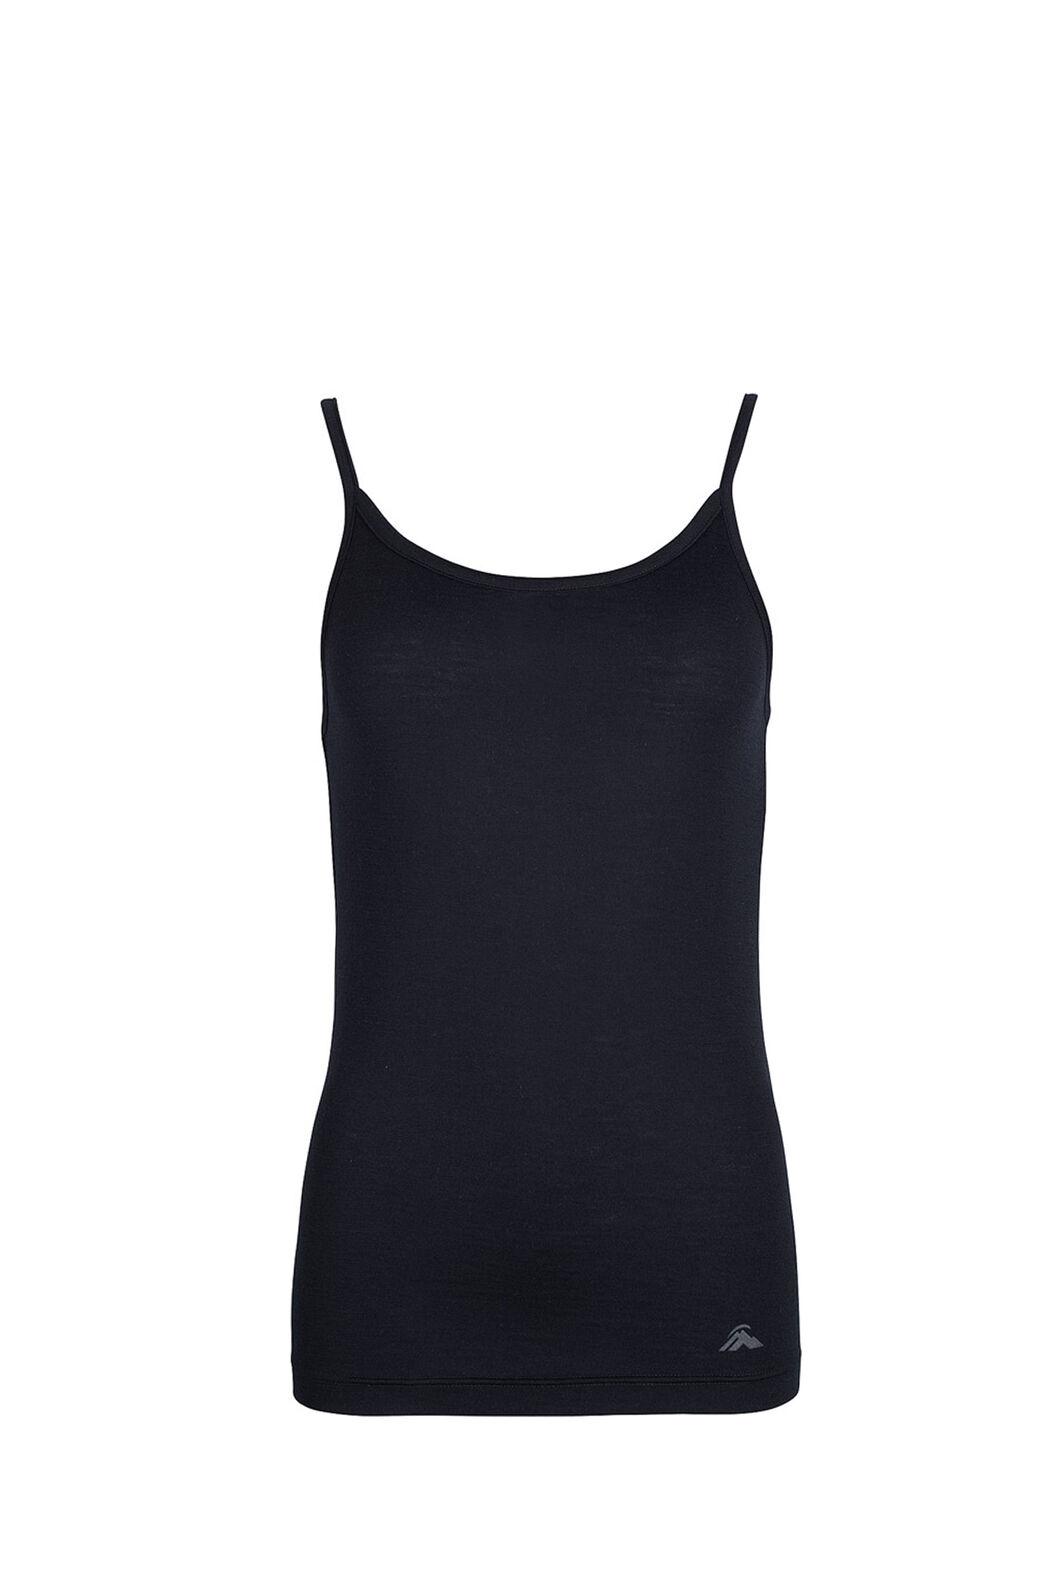 Macpac 150 Merino Camisole — Women's, Black, hi-res